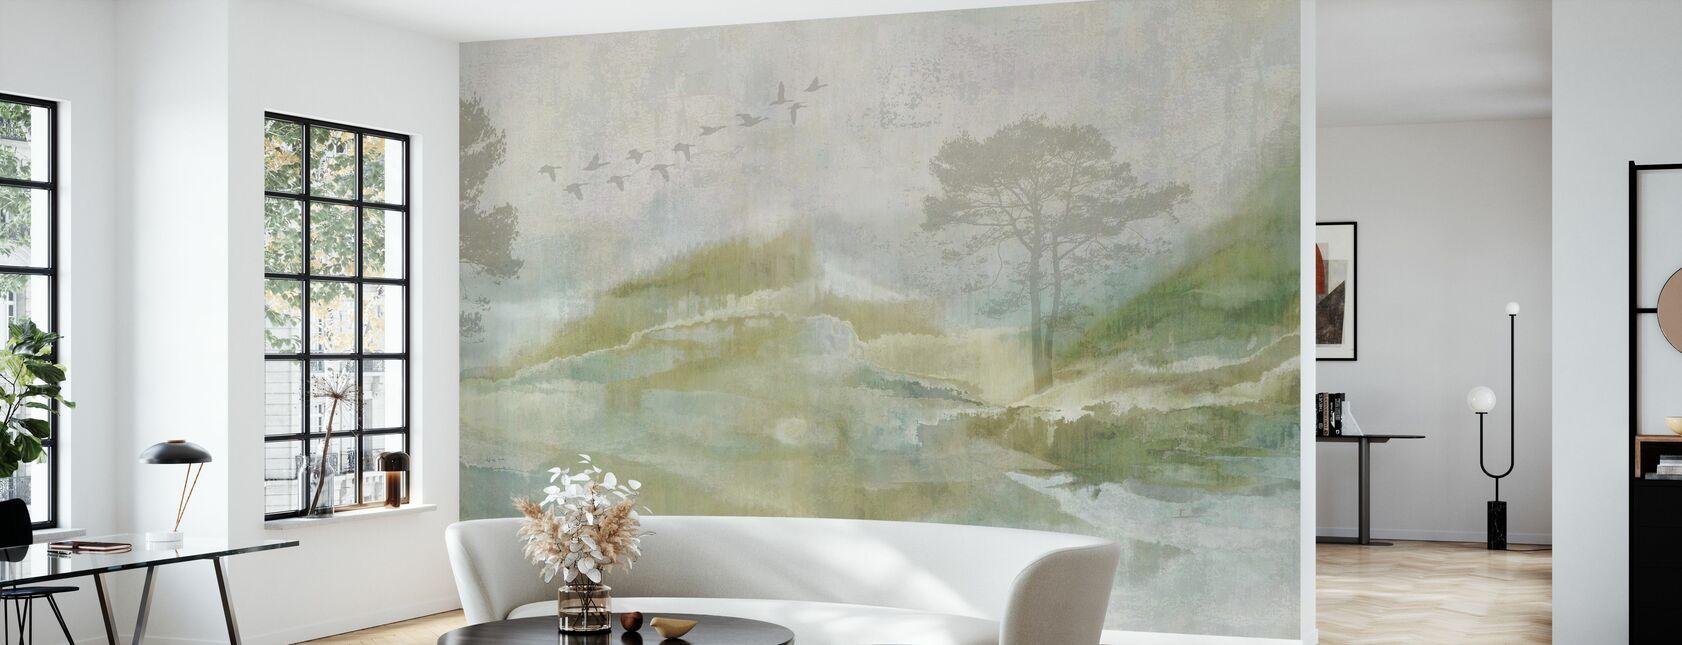 Dreamy Landscape - Wallpaper - Living Room